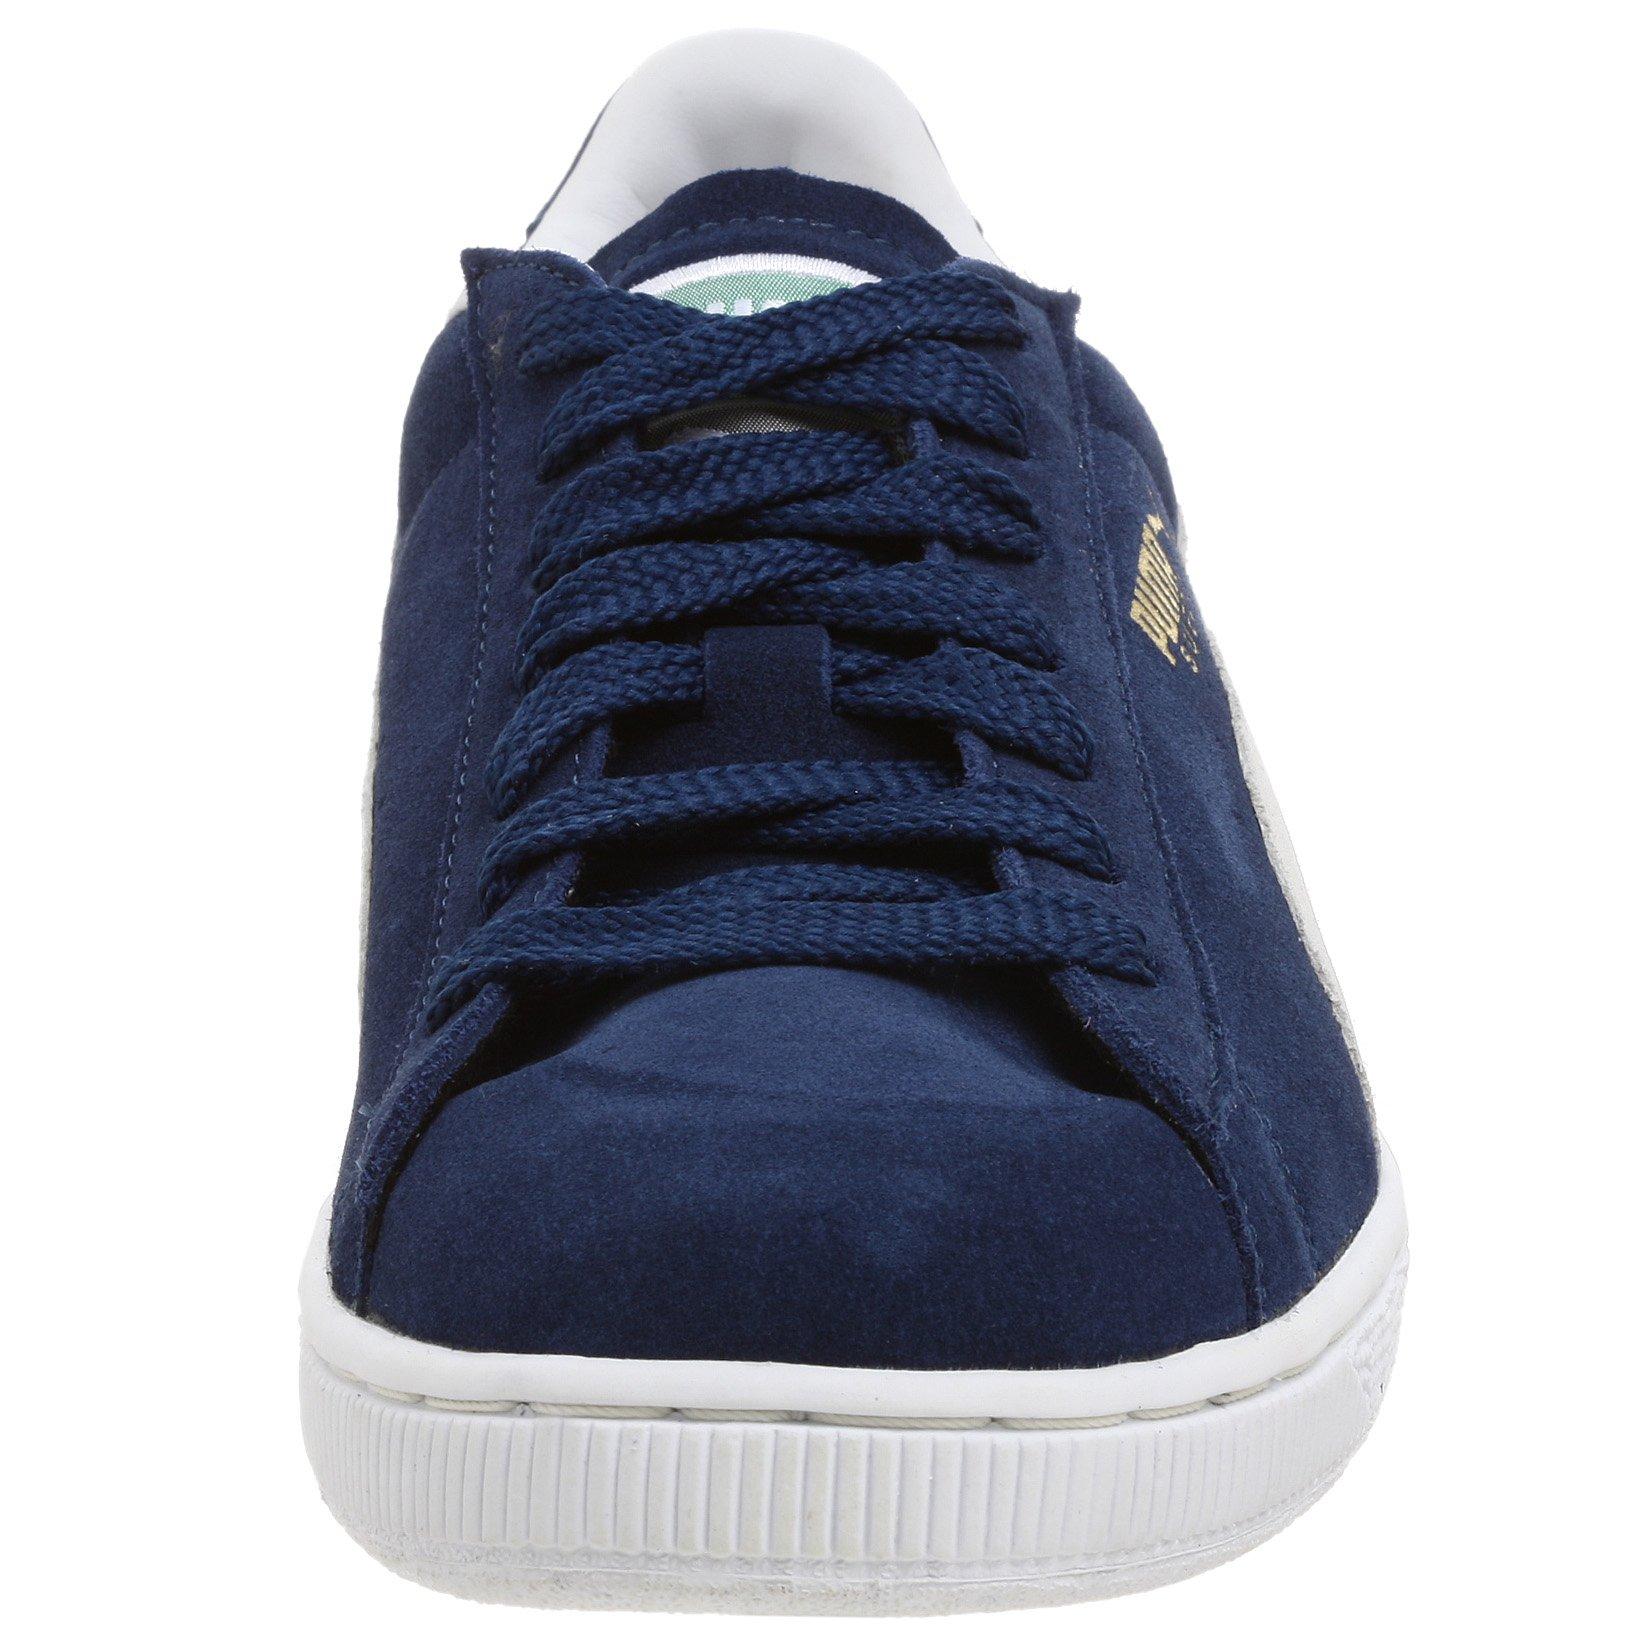 PUMA Suede Classic Sneaker,Blue/White,8 M US Men's by PUMA (Image #4)